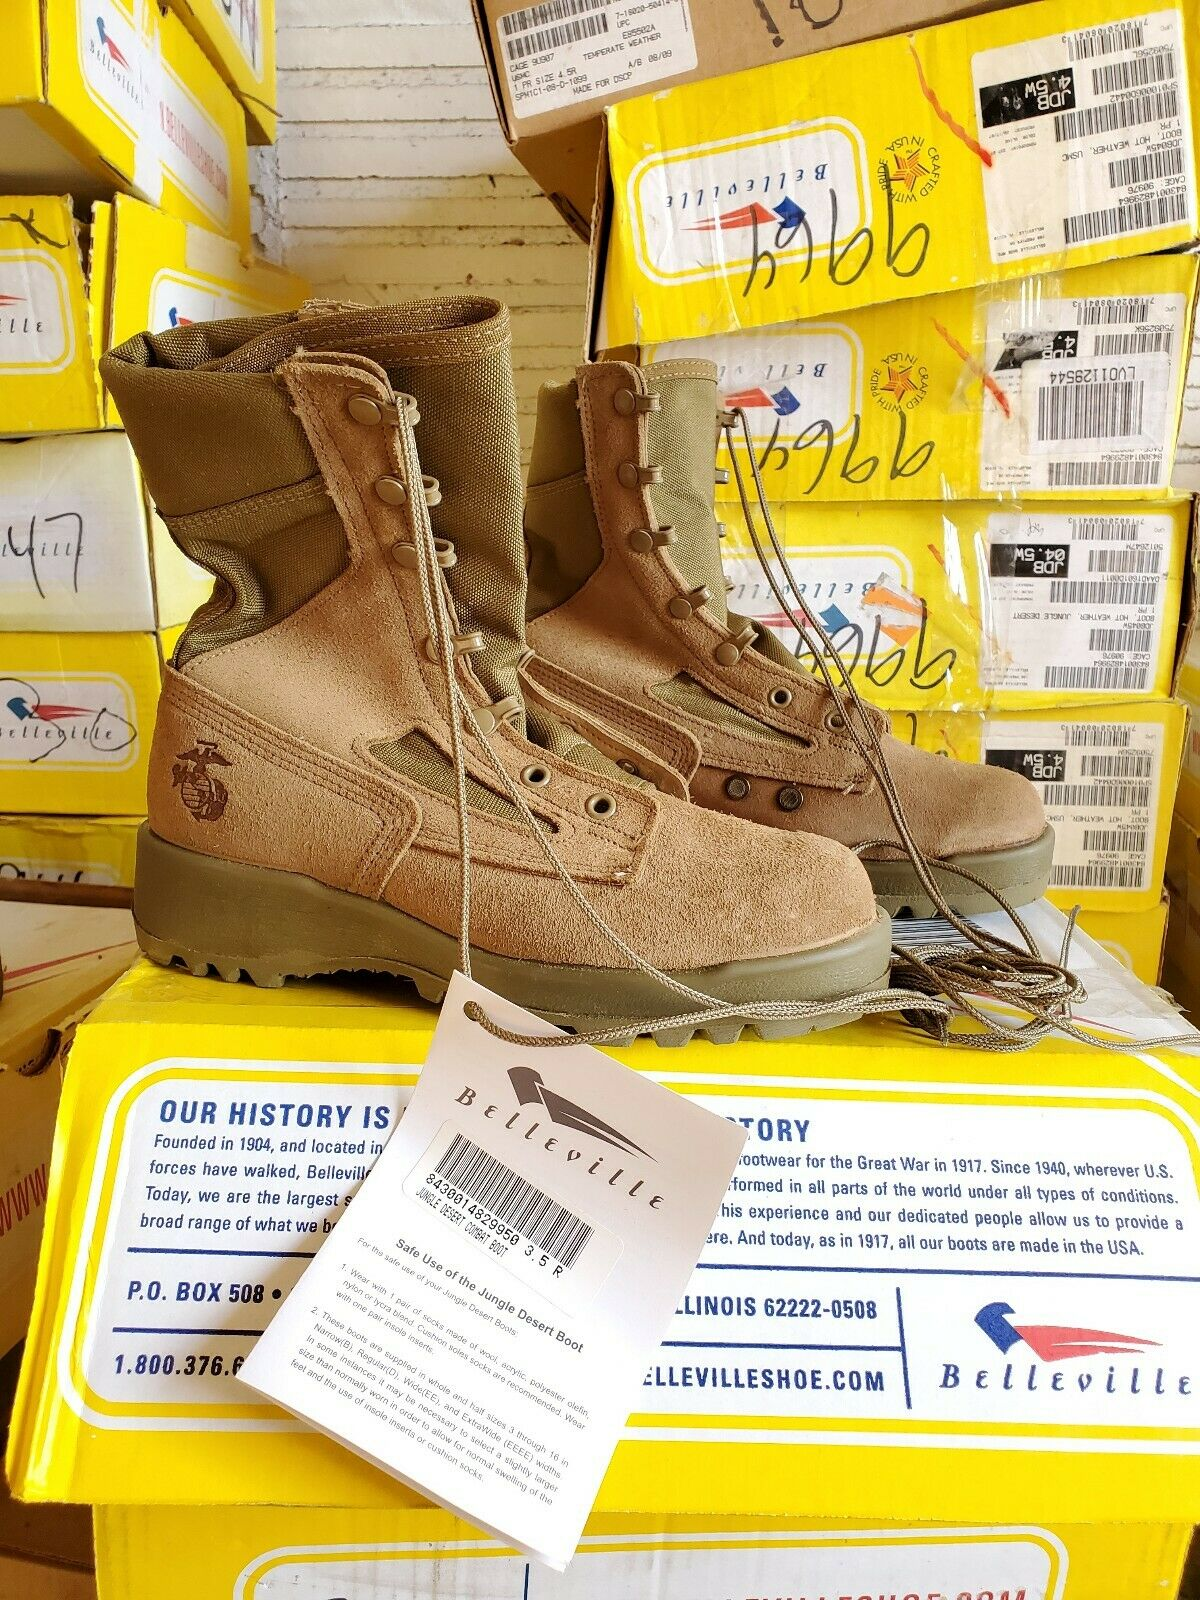 Men's Belleville JDB Hot Weather Military Combat Tactical Jump Boots Size 3 XW